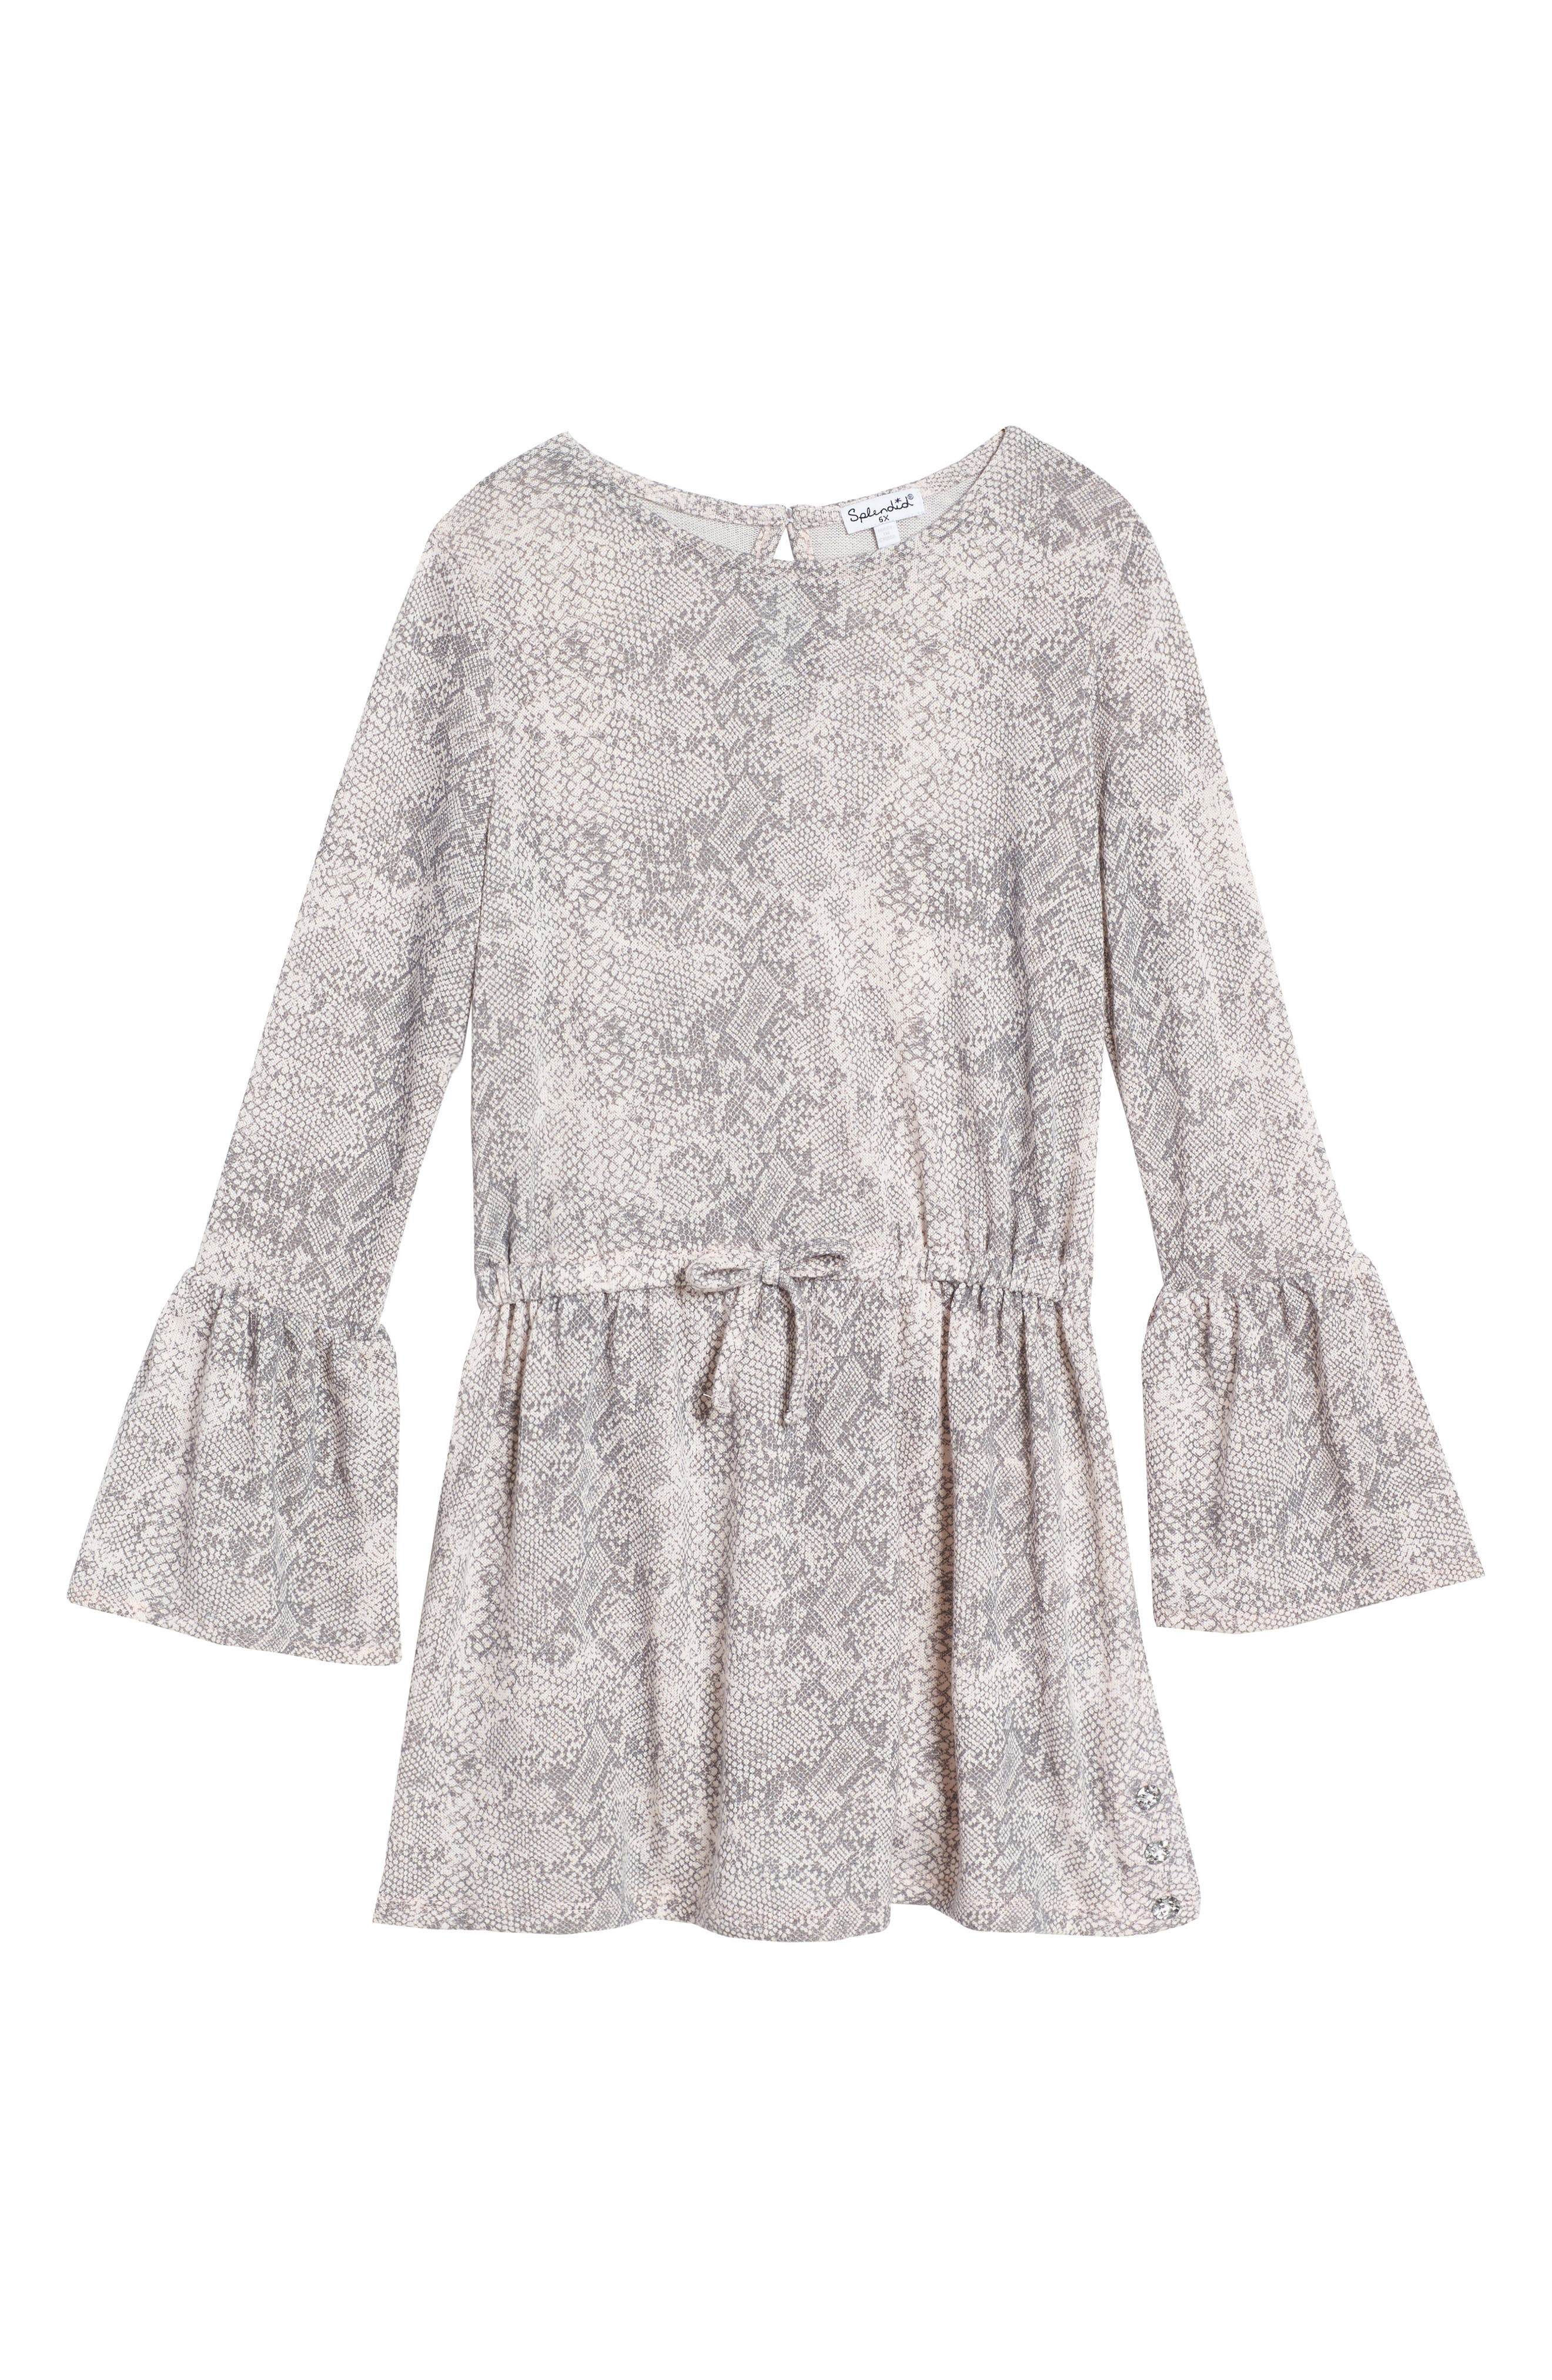 Python Print Loose Knit Dress,                         Main,                         color, 655